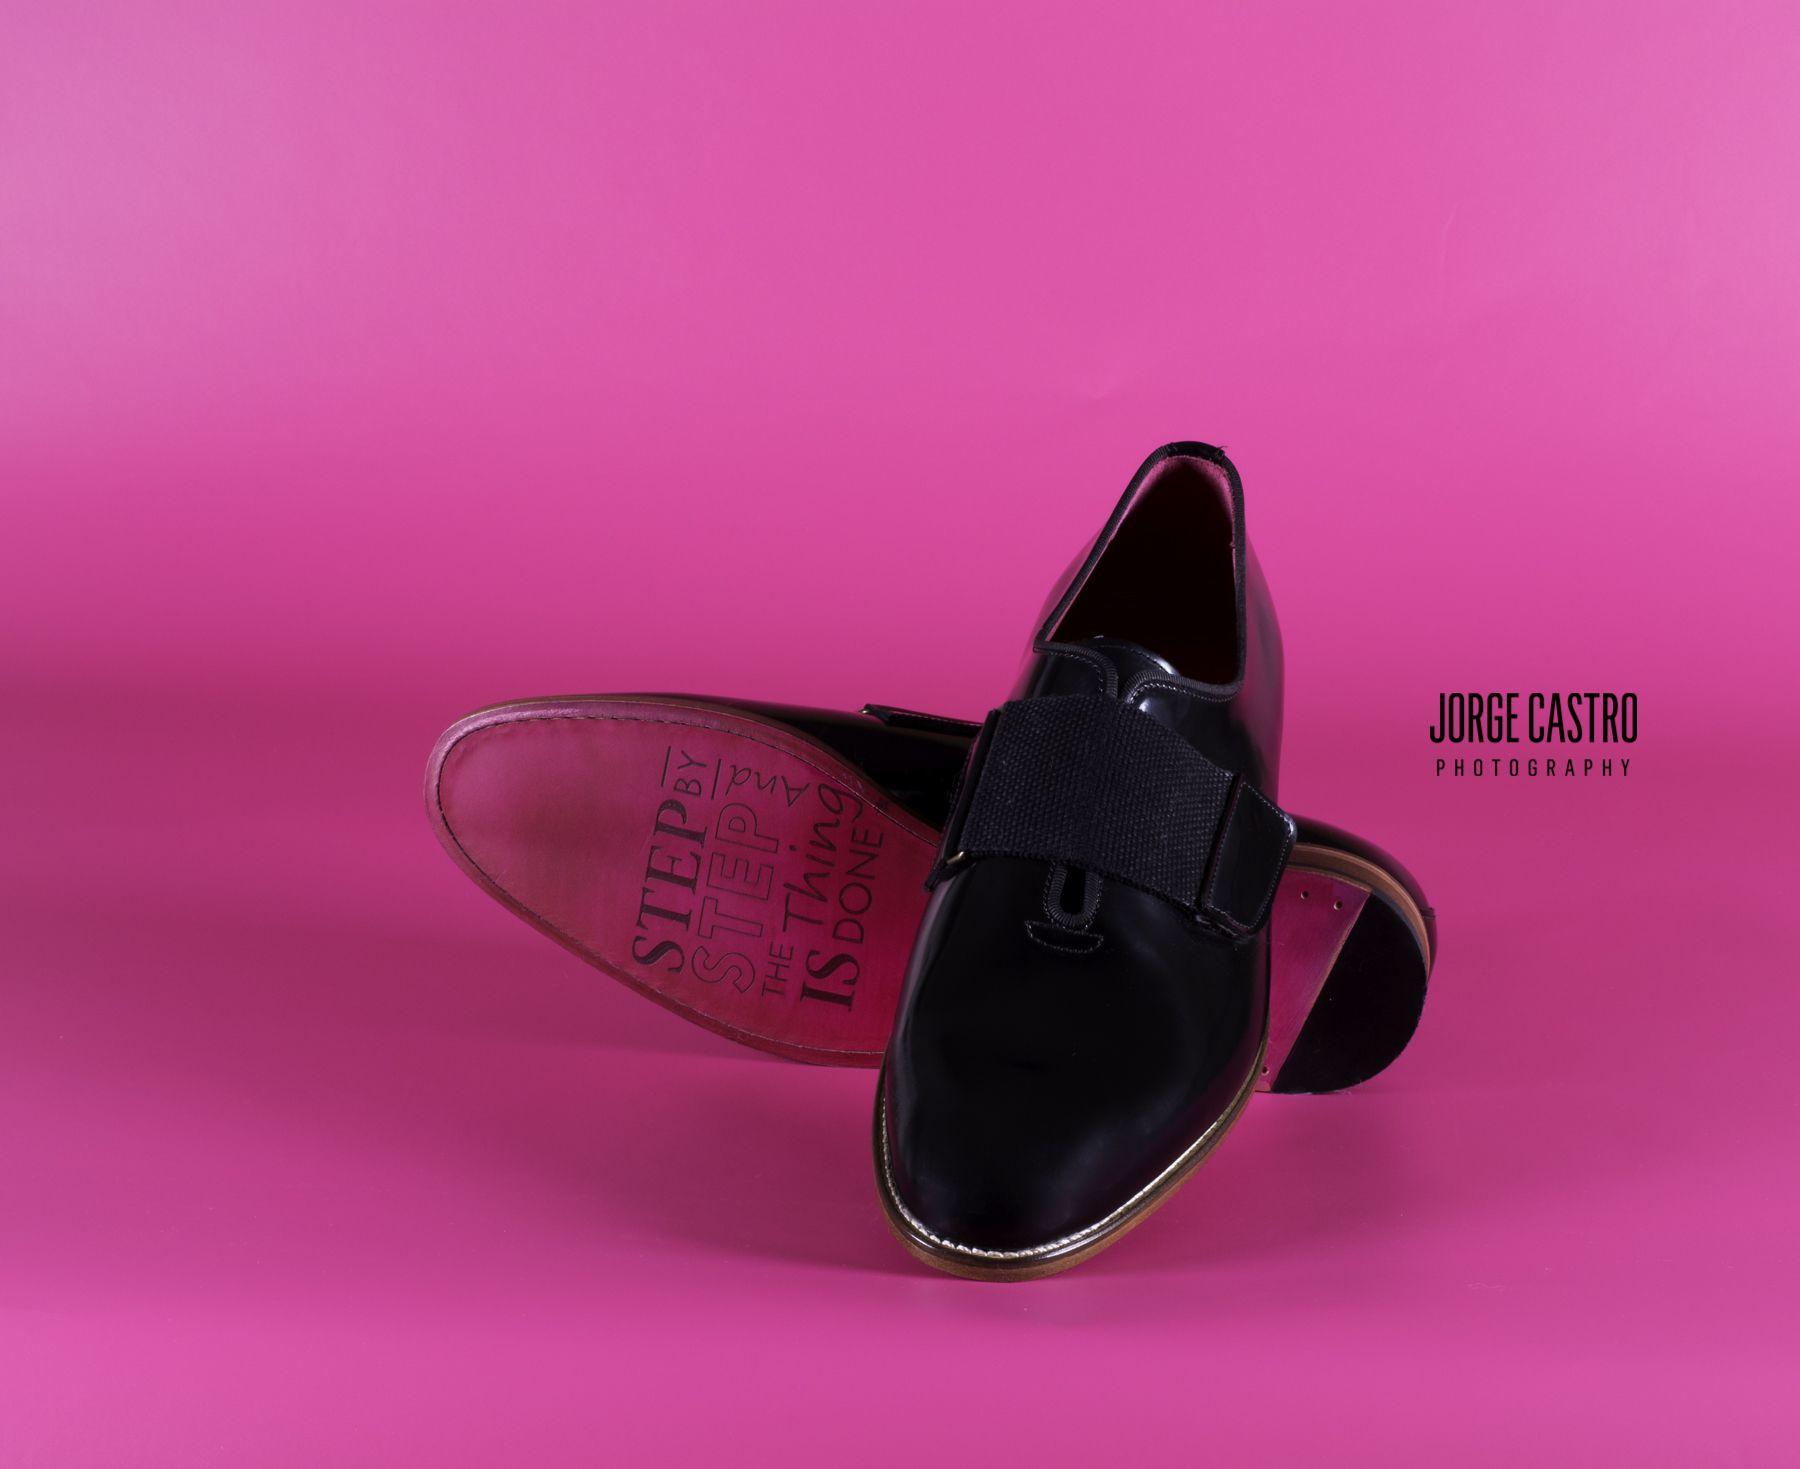 #vicriporto #sapatos #photography #pink #fotografiadeproduto #sapatosmadeemportugal #clasico #fashion #sapatopreto  #porto #portugal #madeemportugal